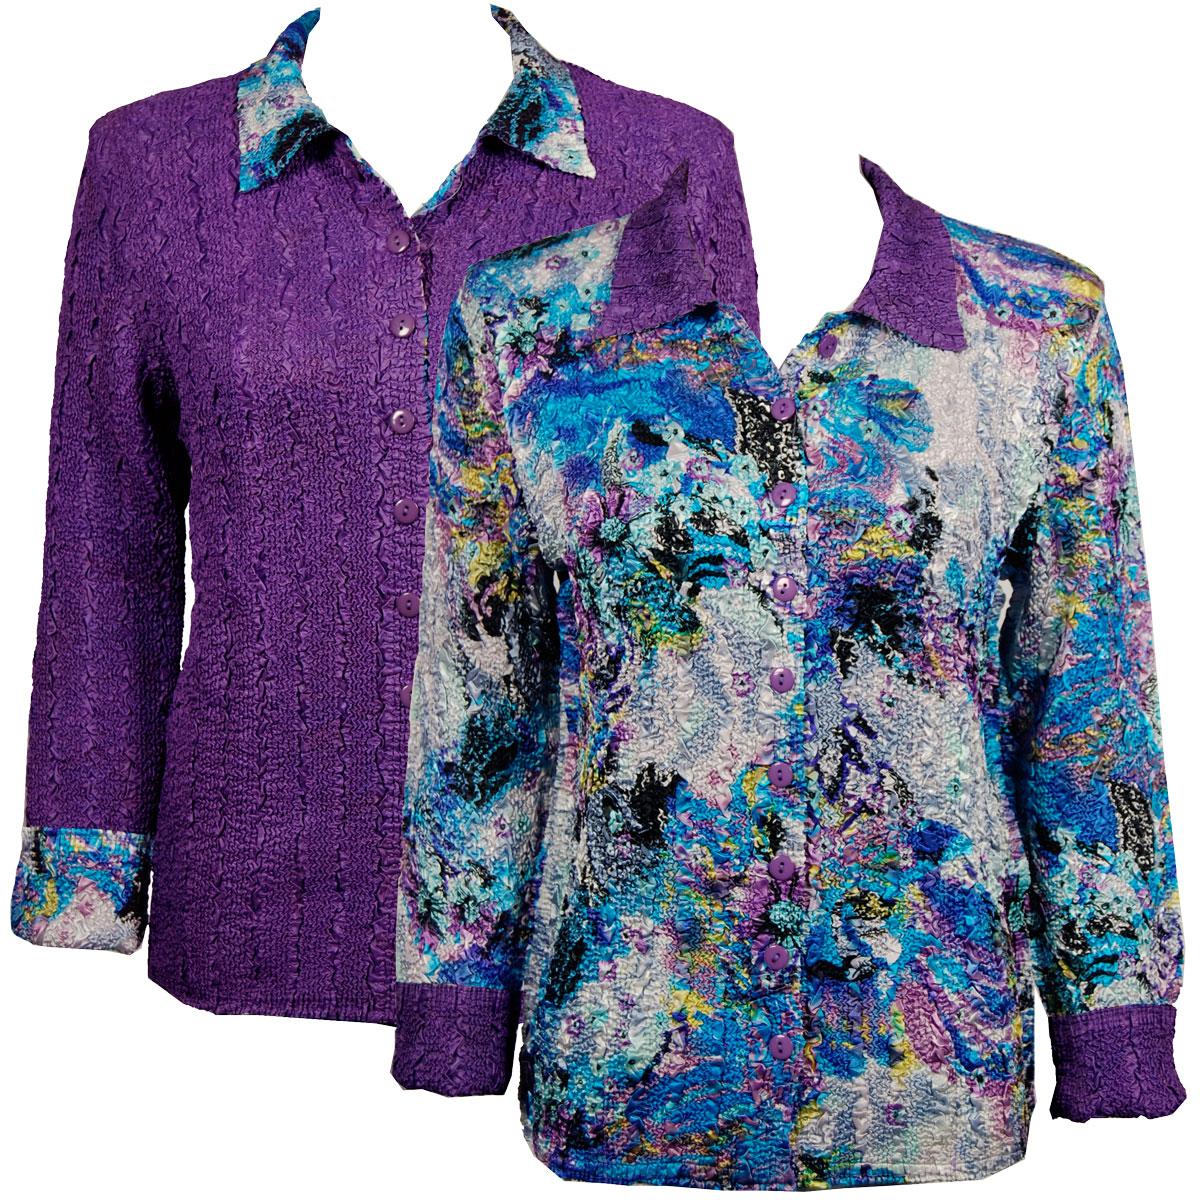 Wholesale Magic Crush - Reversible Jackets Paint Splatter Aqua-Purple reverses to Solid Dark Purple -      S-M